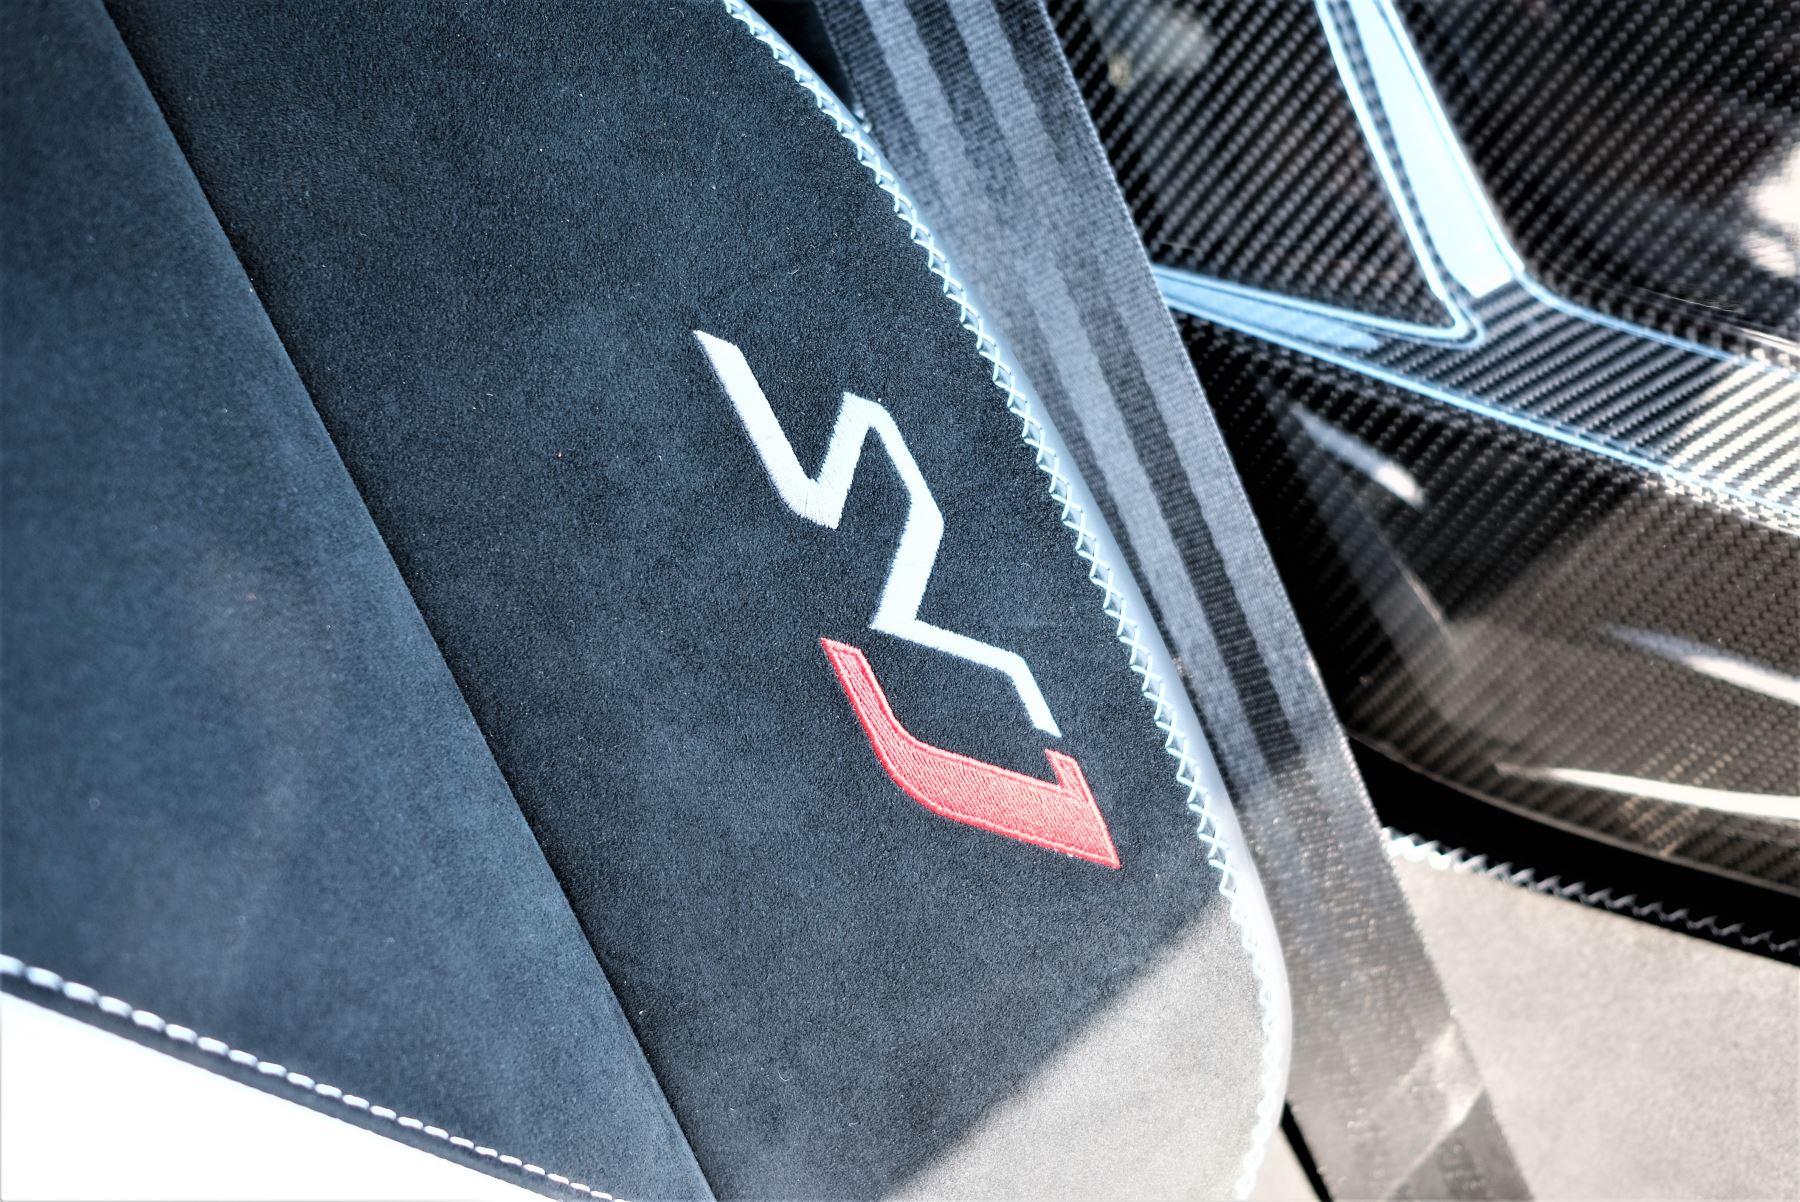 Lamborghini Aventador SVJ Coupe VAT Qualifying image 20